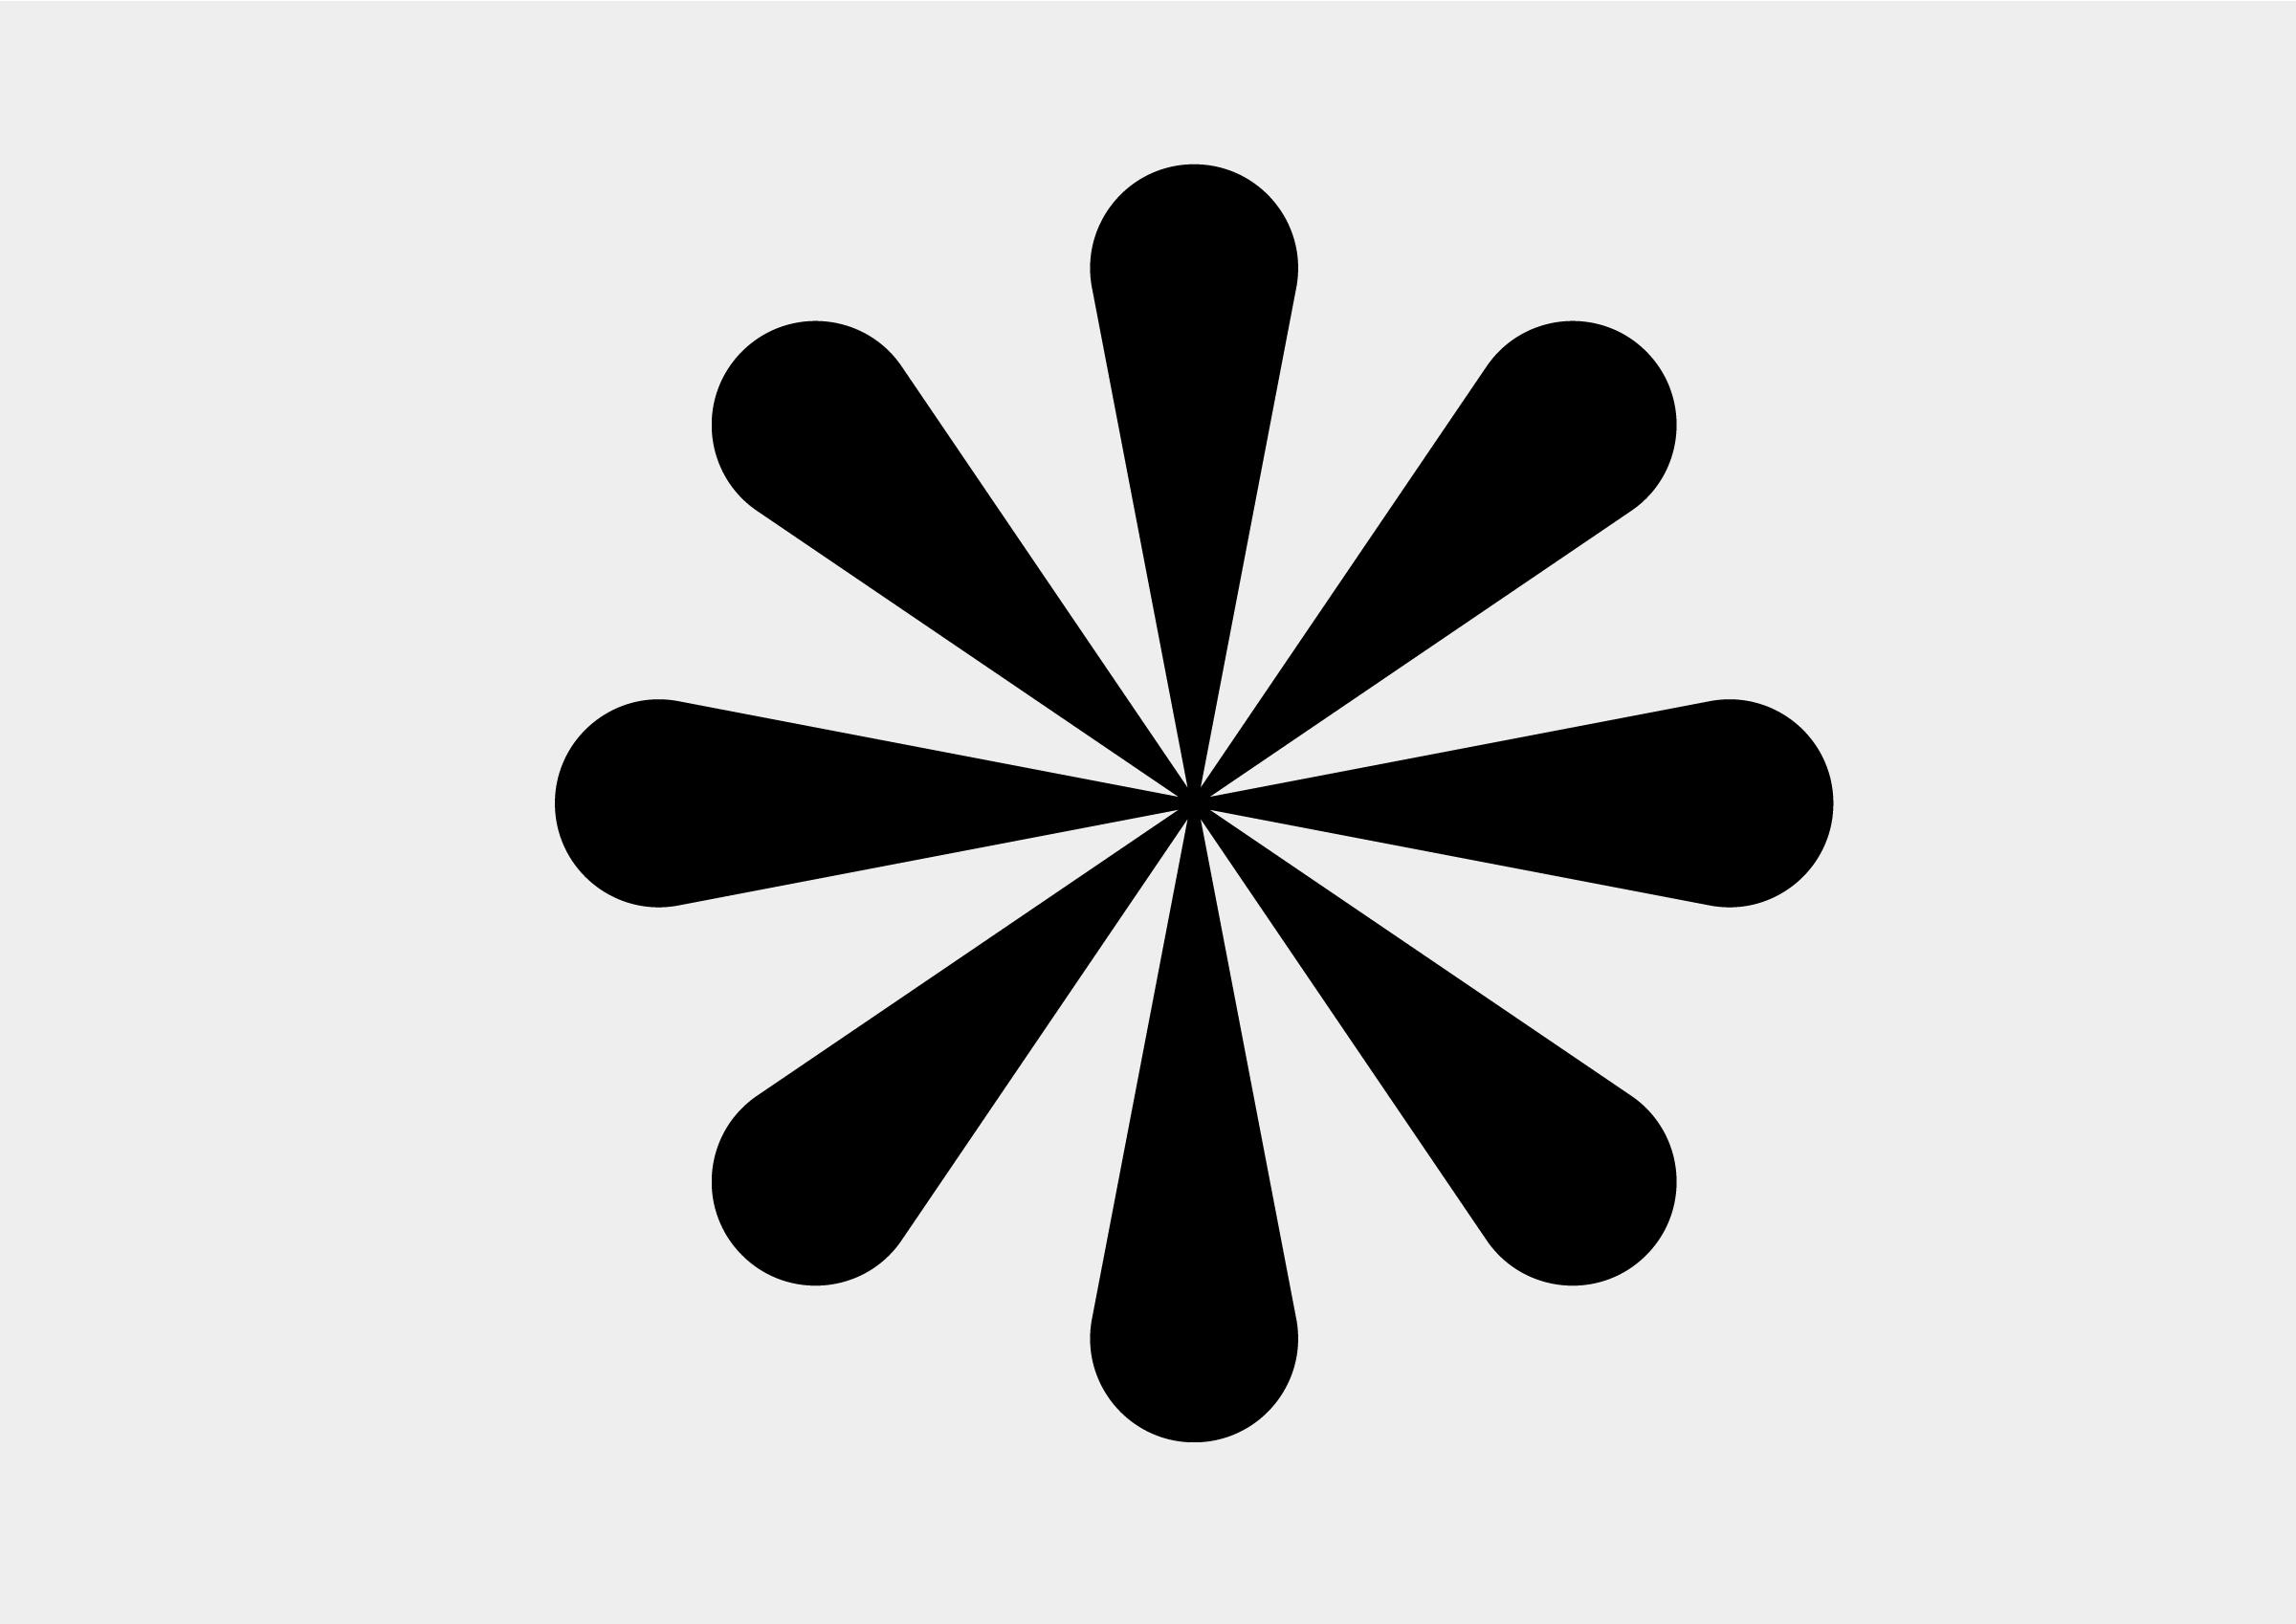 symbols nille s lindqvist